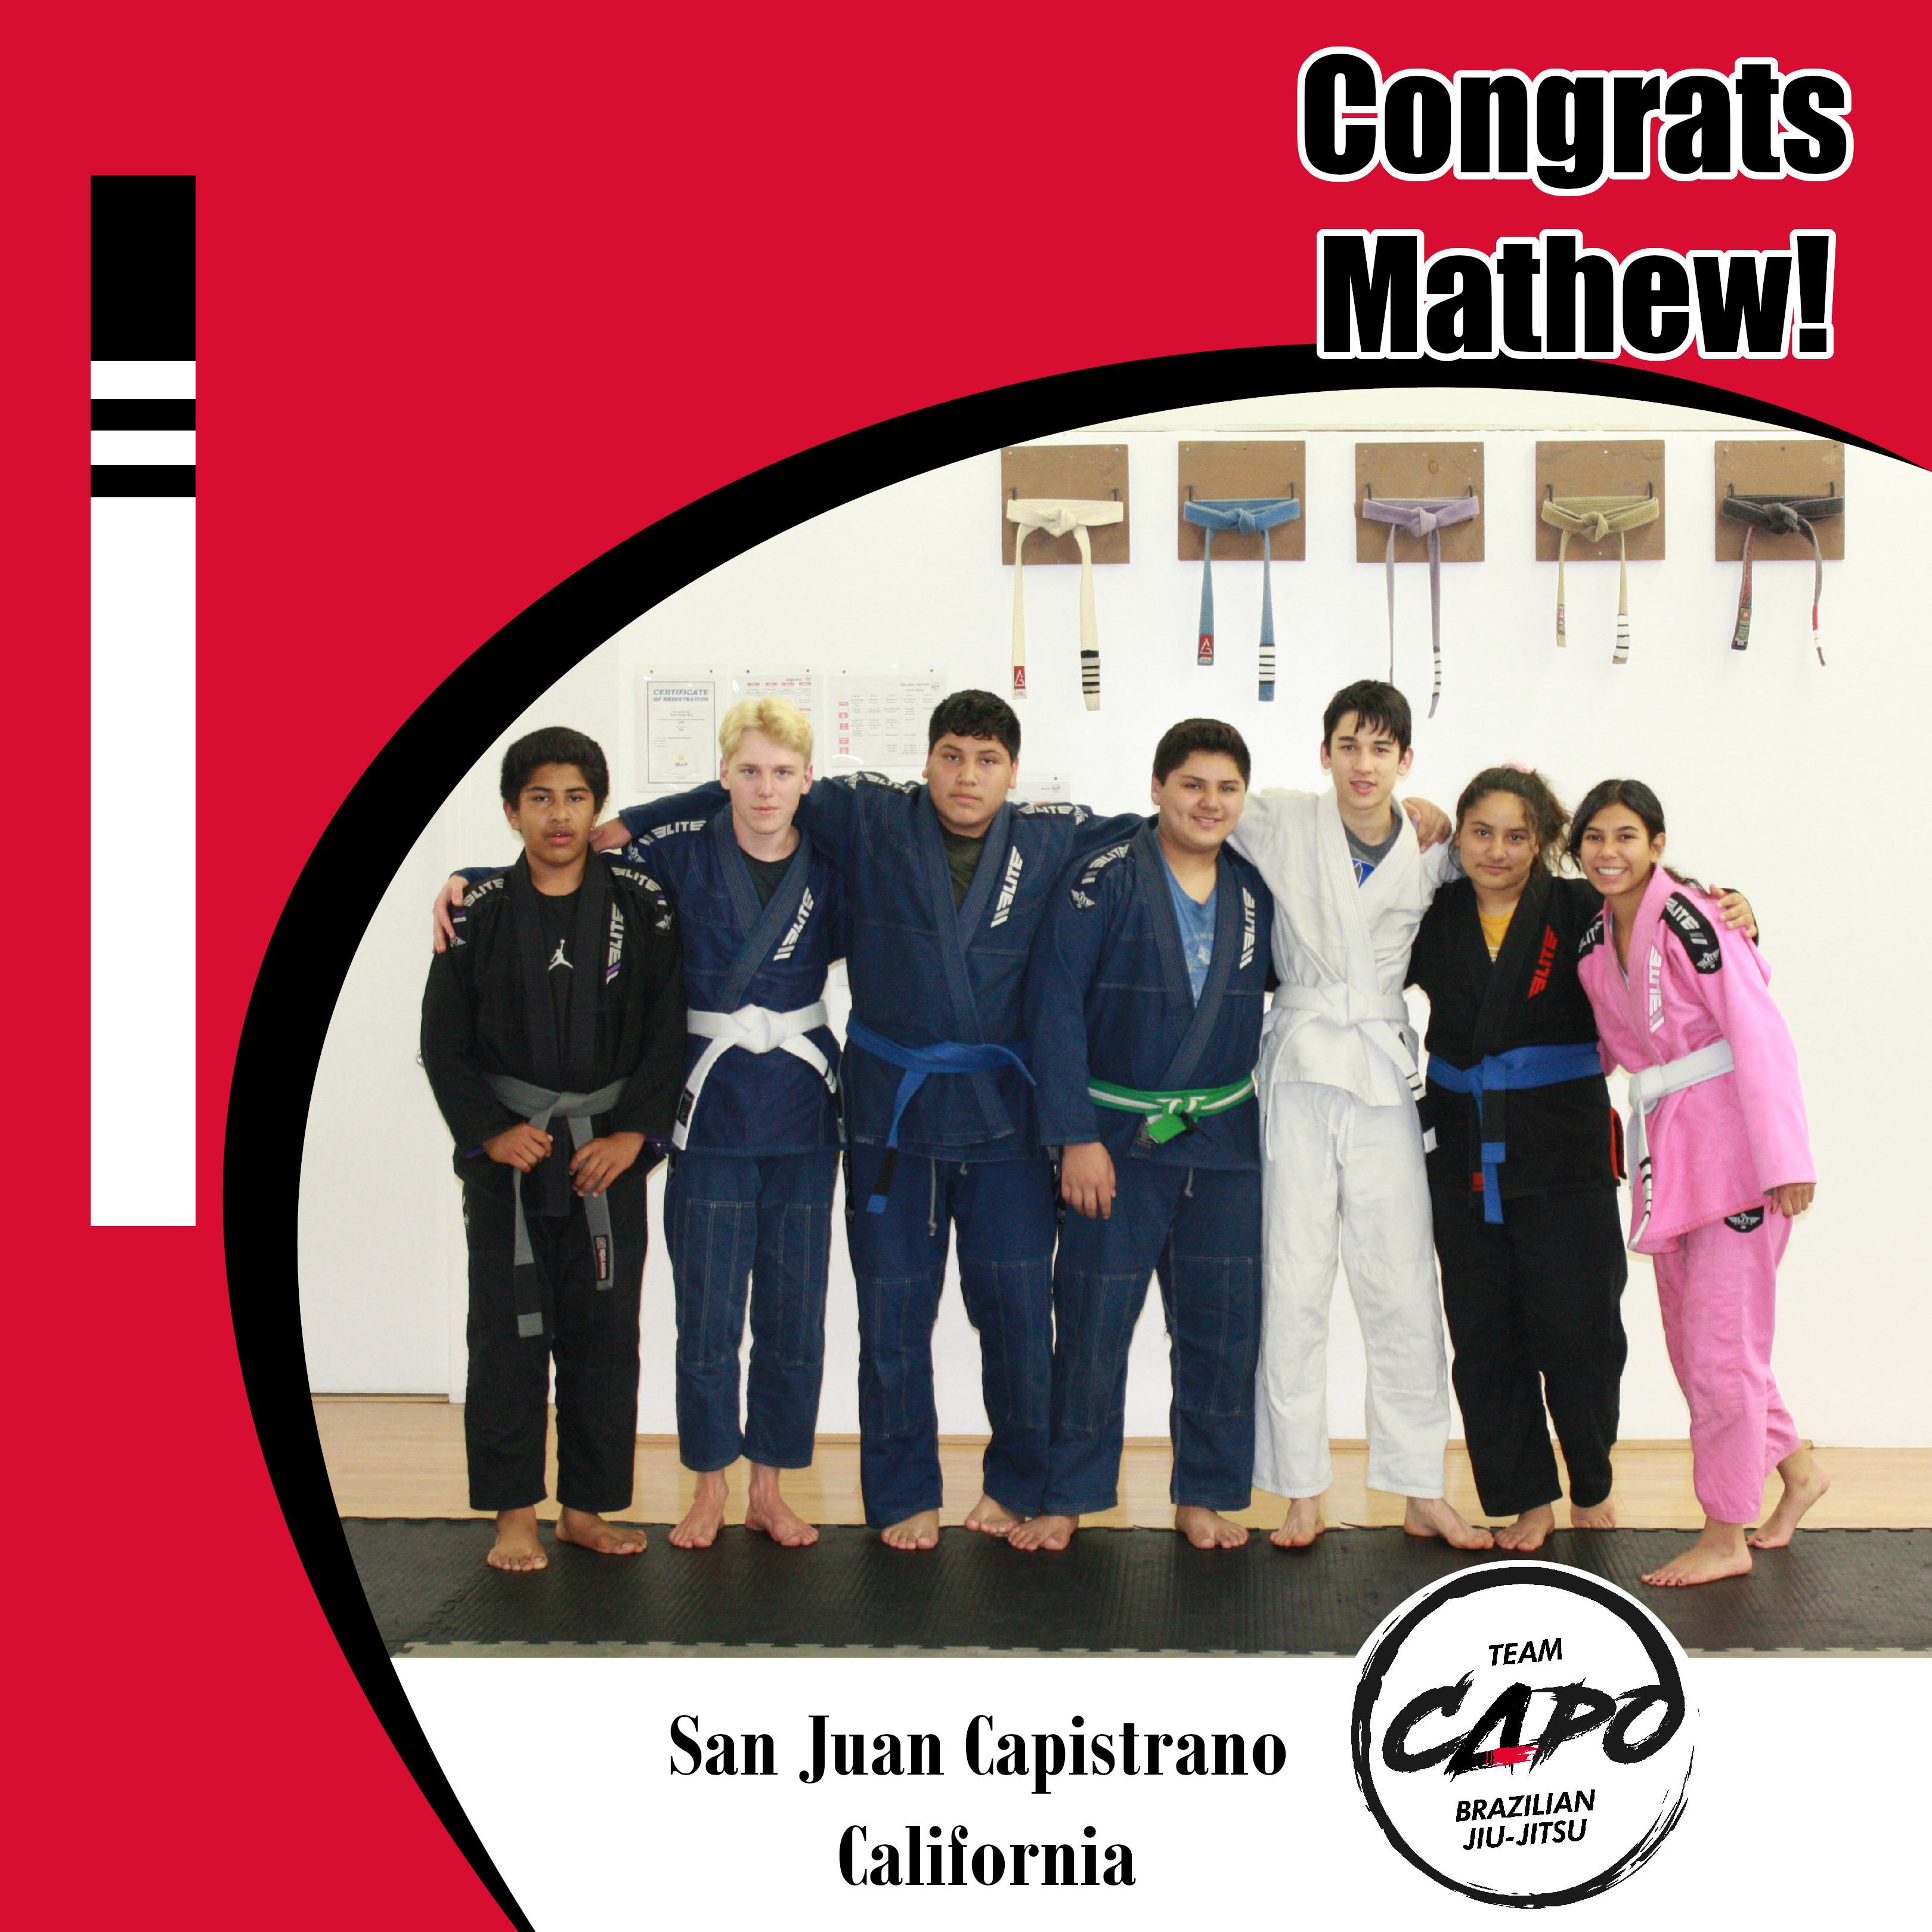 Congrats Mathew!